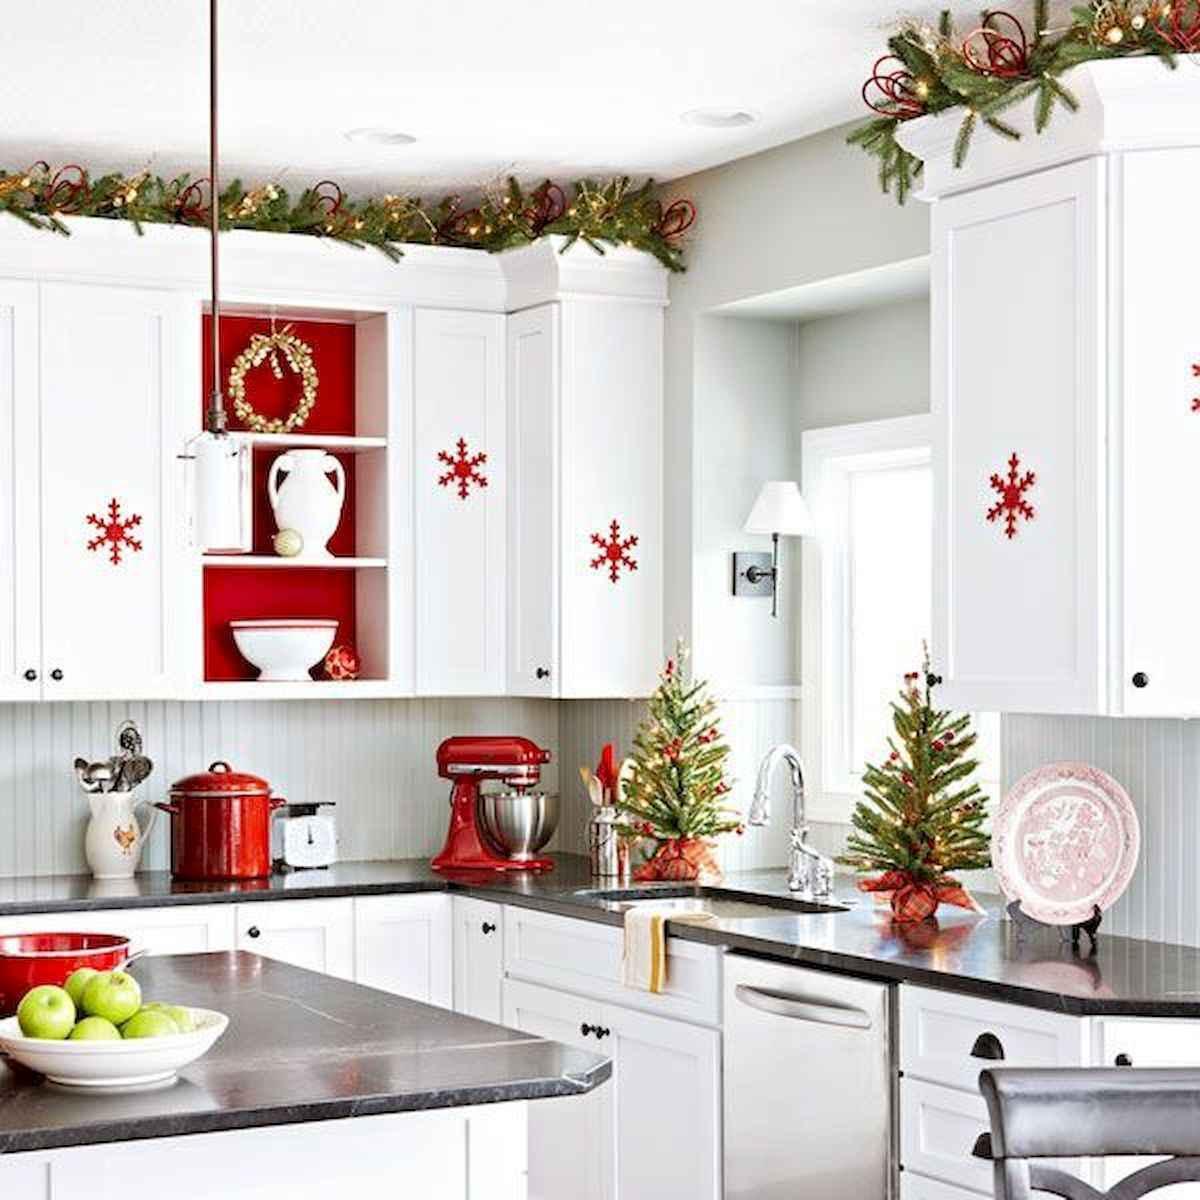 20 Elegant Christmas Kitchen Decor Ideas And Makeover (11)